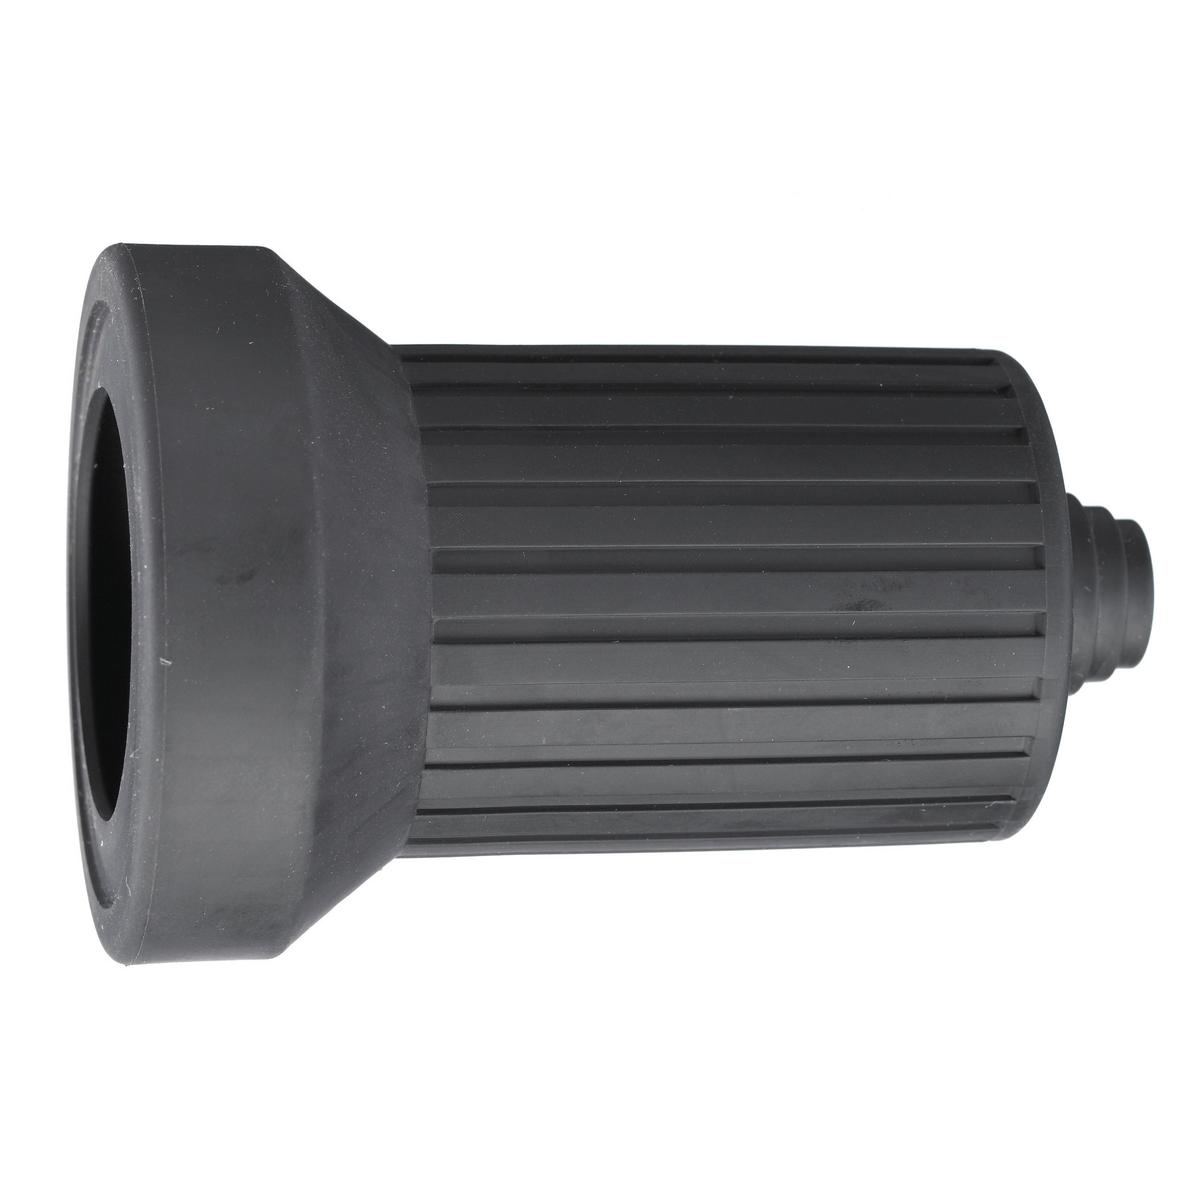 Hubbell HBL6024 Black Straight Blade Weatherproof Boot